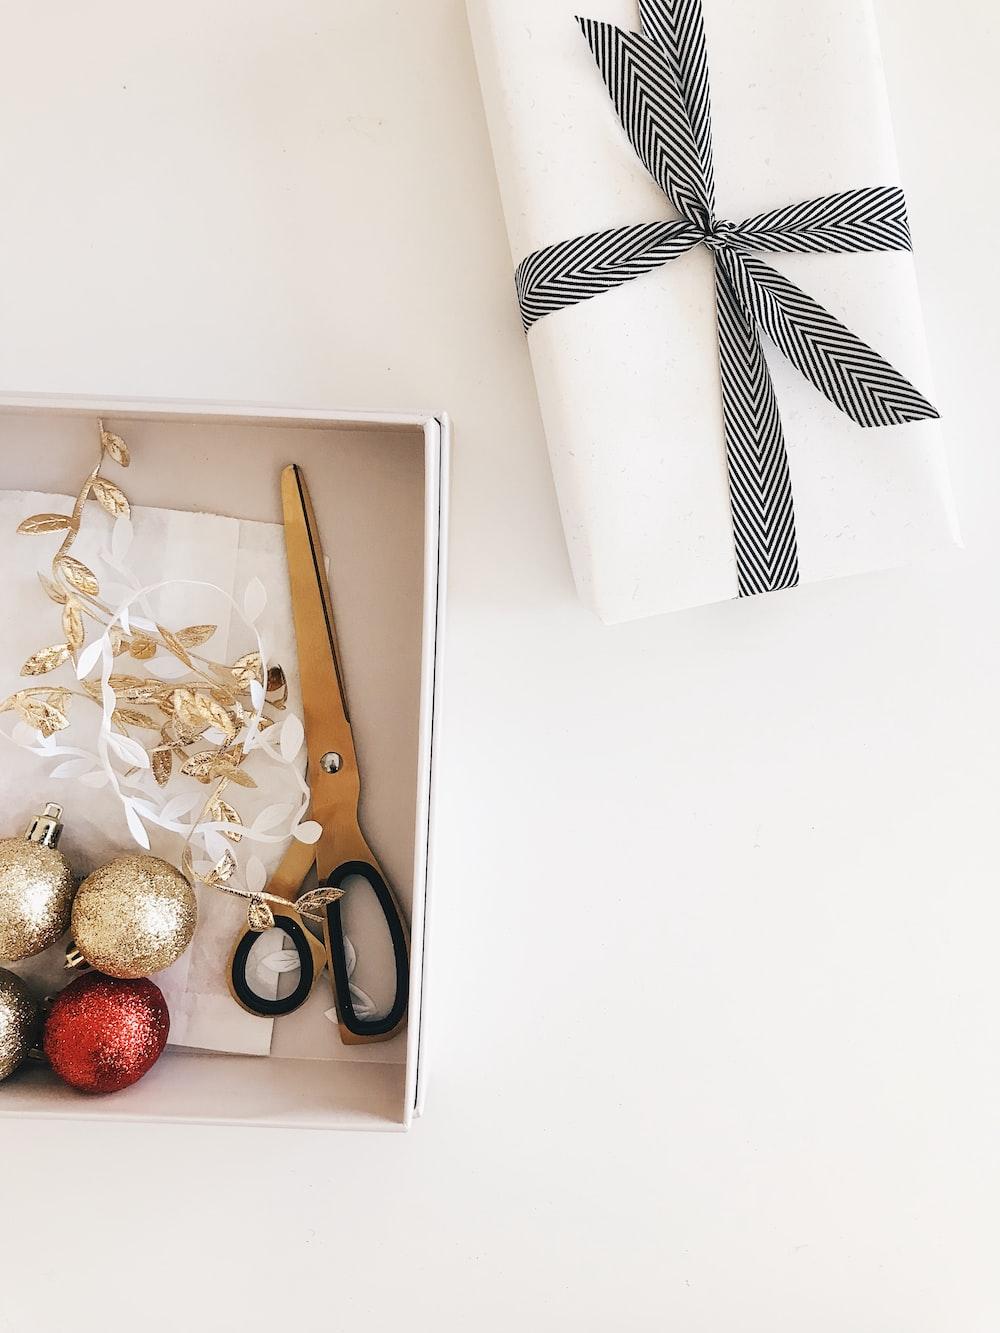 black scissors on the box